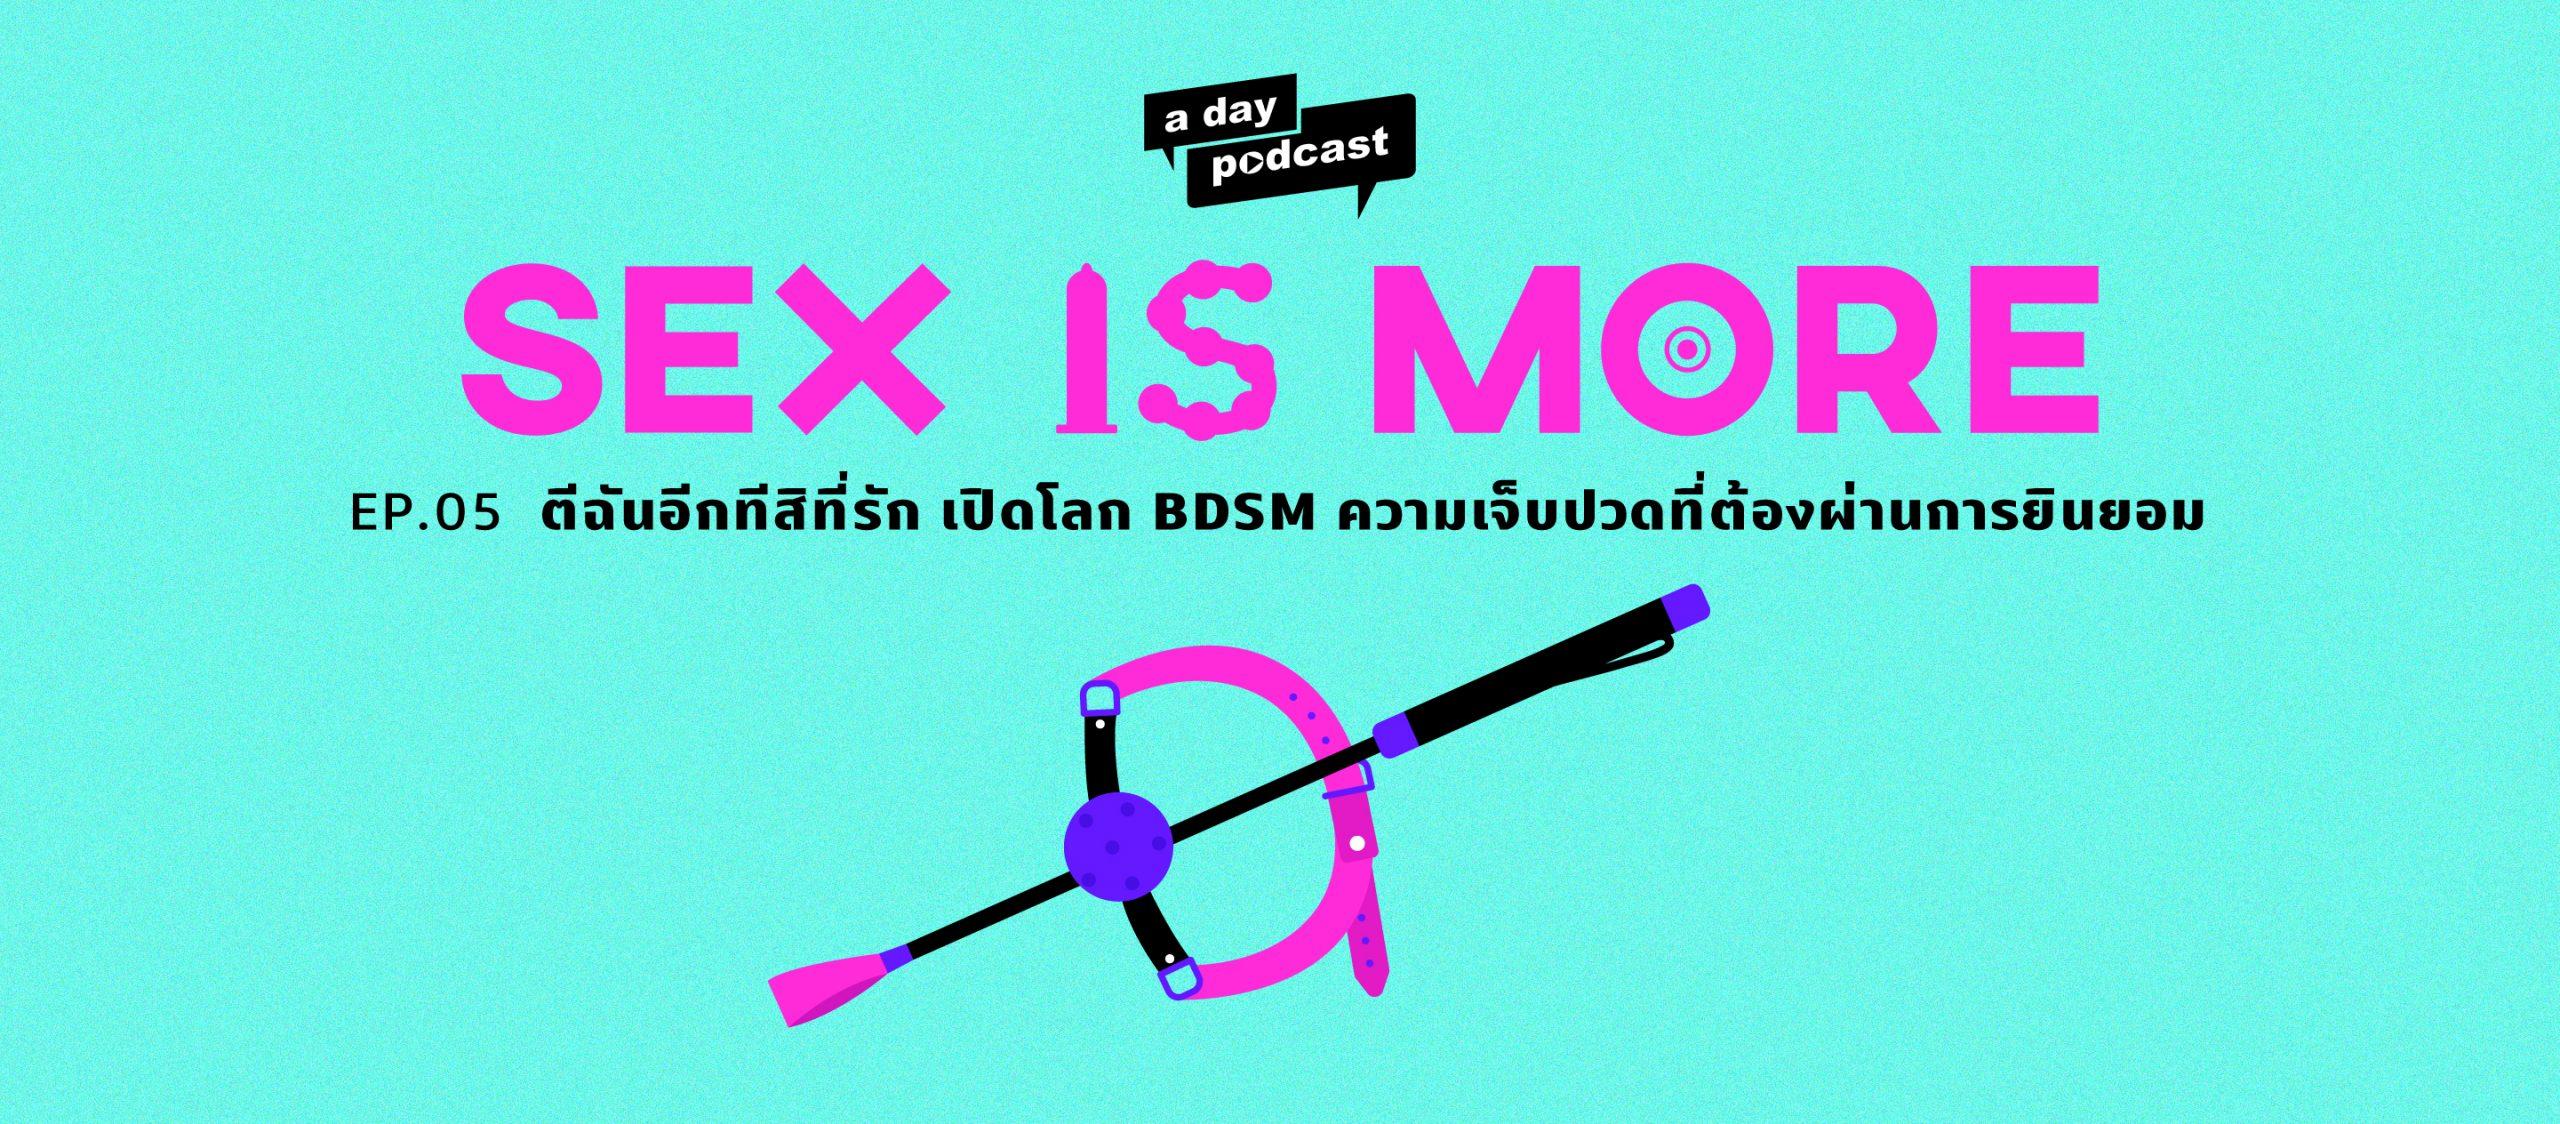 Sex is More EP.05 ตีฉันอีกทีสิที่รัก เปิดโลก BDSM ความเจ็บปวดที่ต้องผ่านการยินยอม